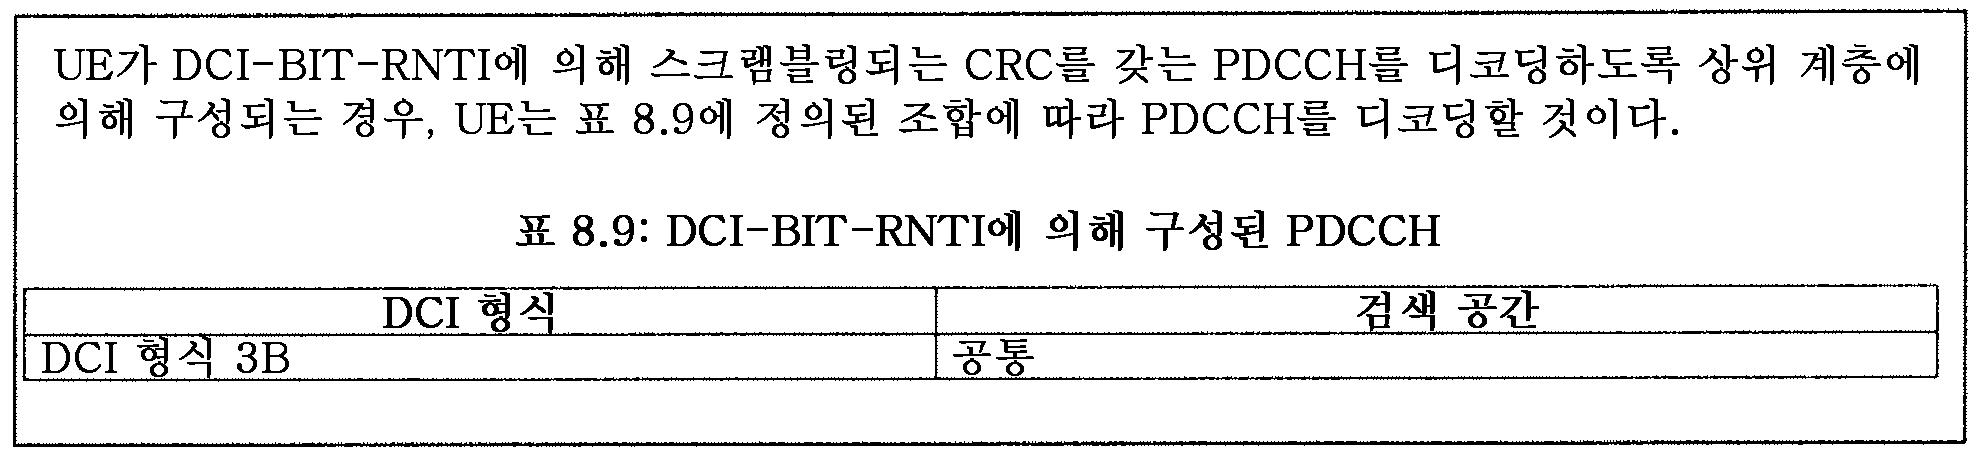 Figure 112014001496964-pct00003